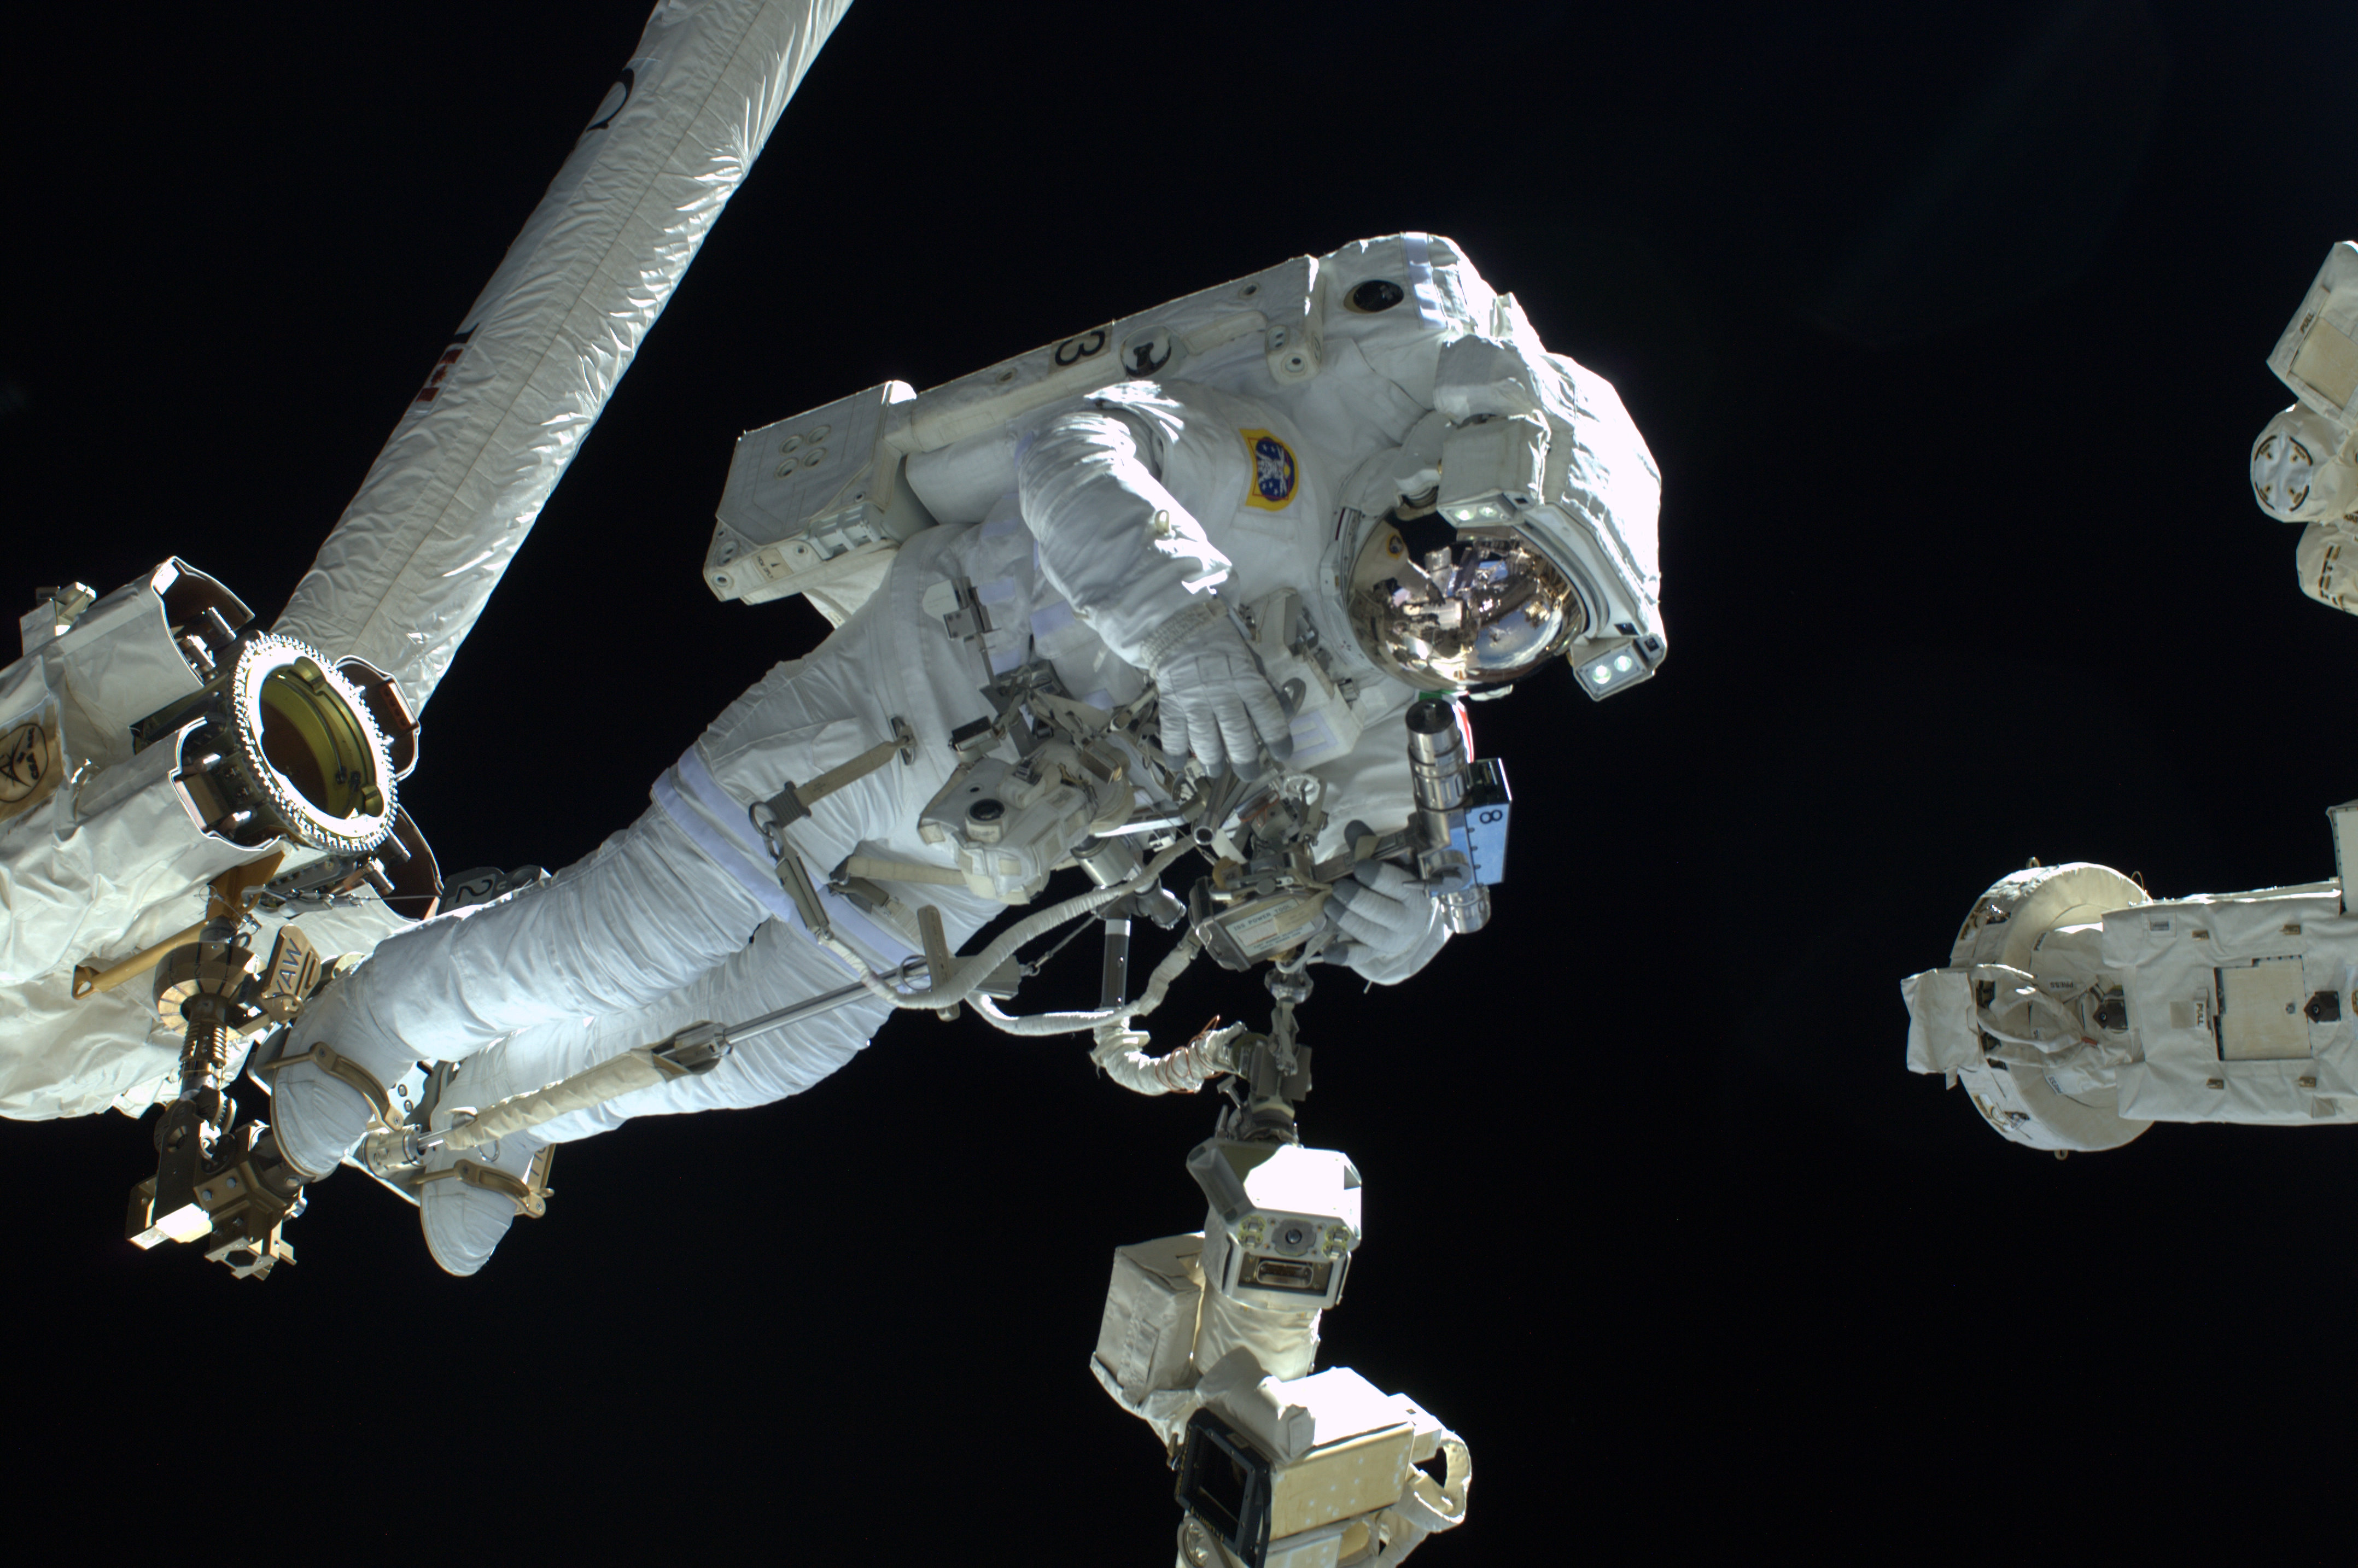 Luca Parmitano Spacewalk